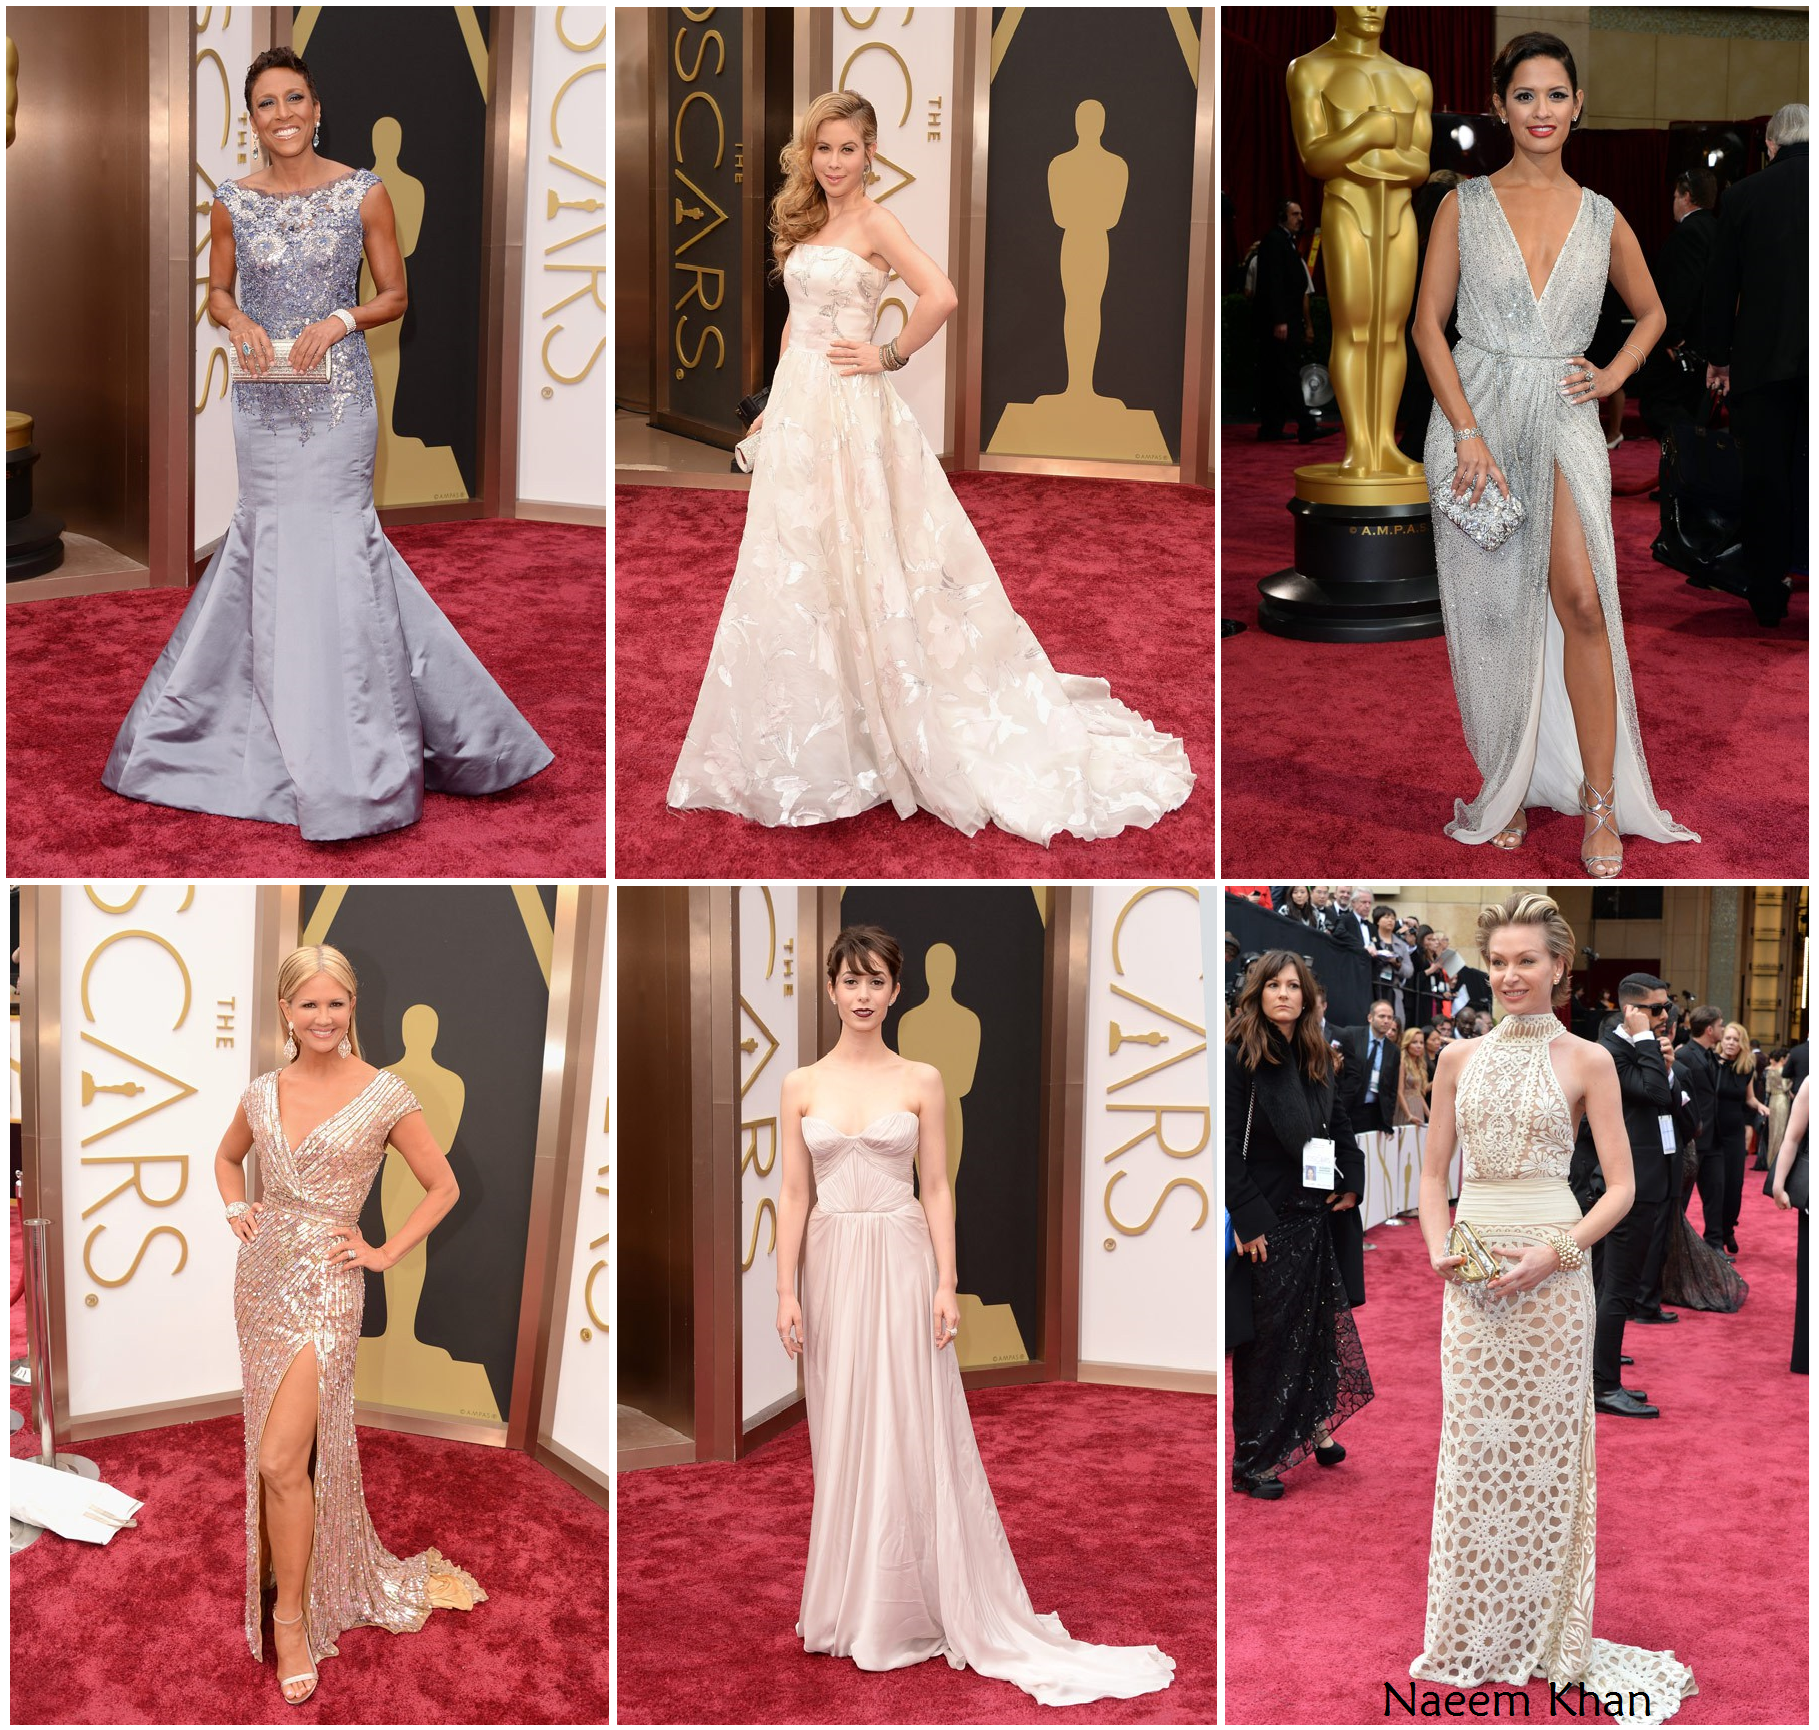 Portia De Rossi Wedding Gown: Robin Roberts, Tara Lipinski, Rocsi Diaz, Nancy O'Dell